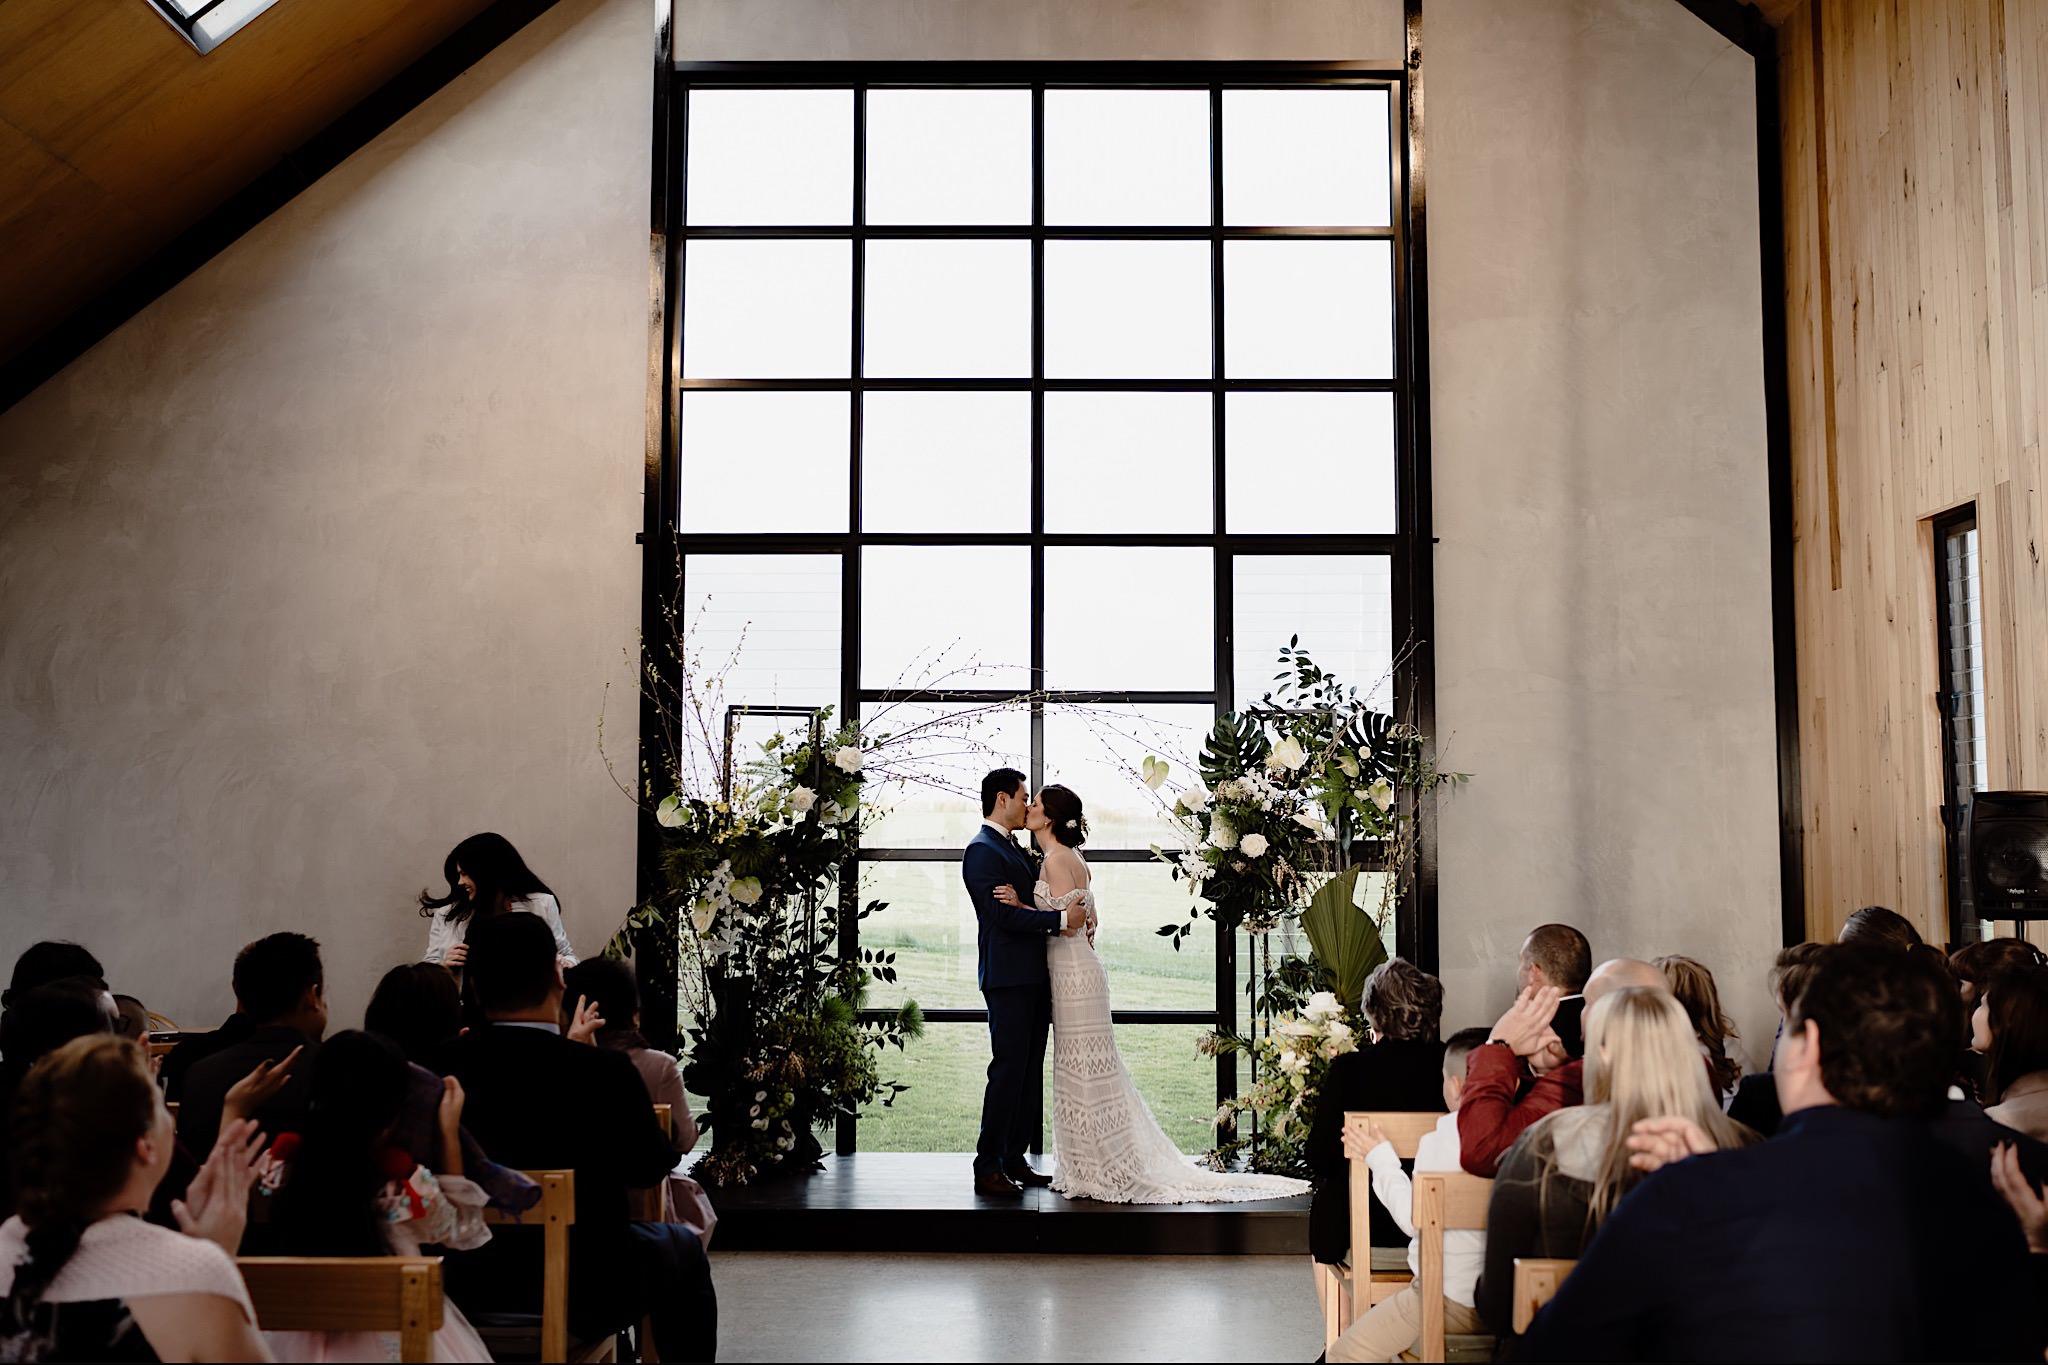 Zonzo Estate Winery Yarra Valley Wedding22.jpg